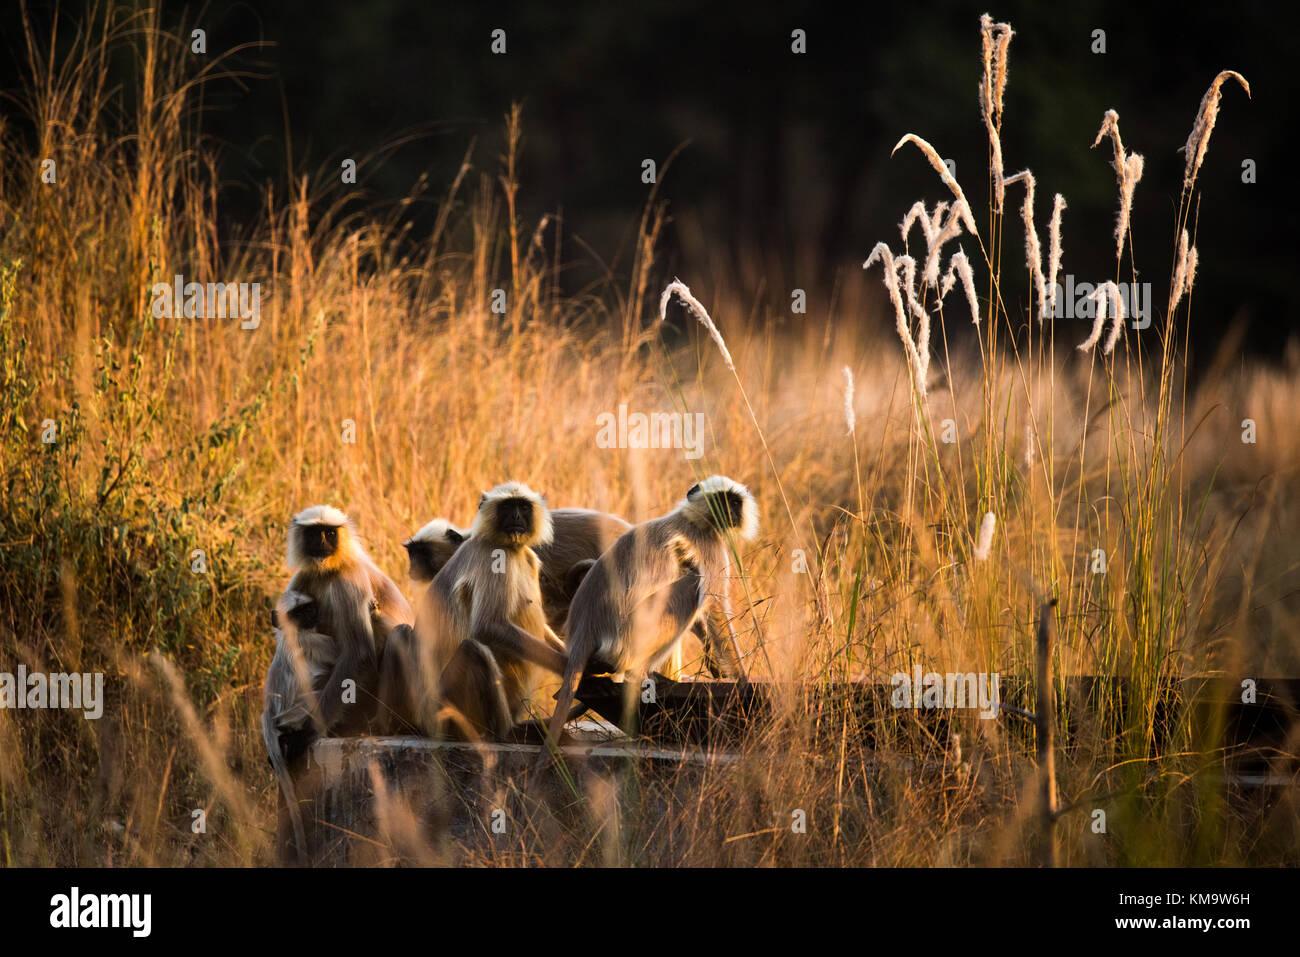 Hanuman langurs in Bandhavgarh National Park - Stock Image